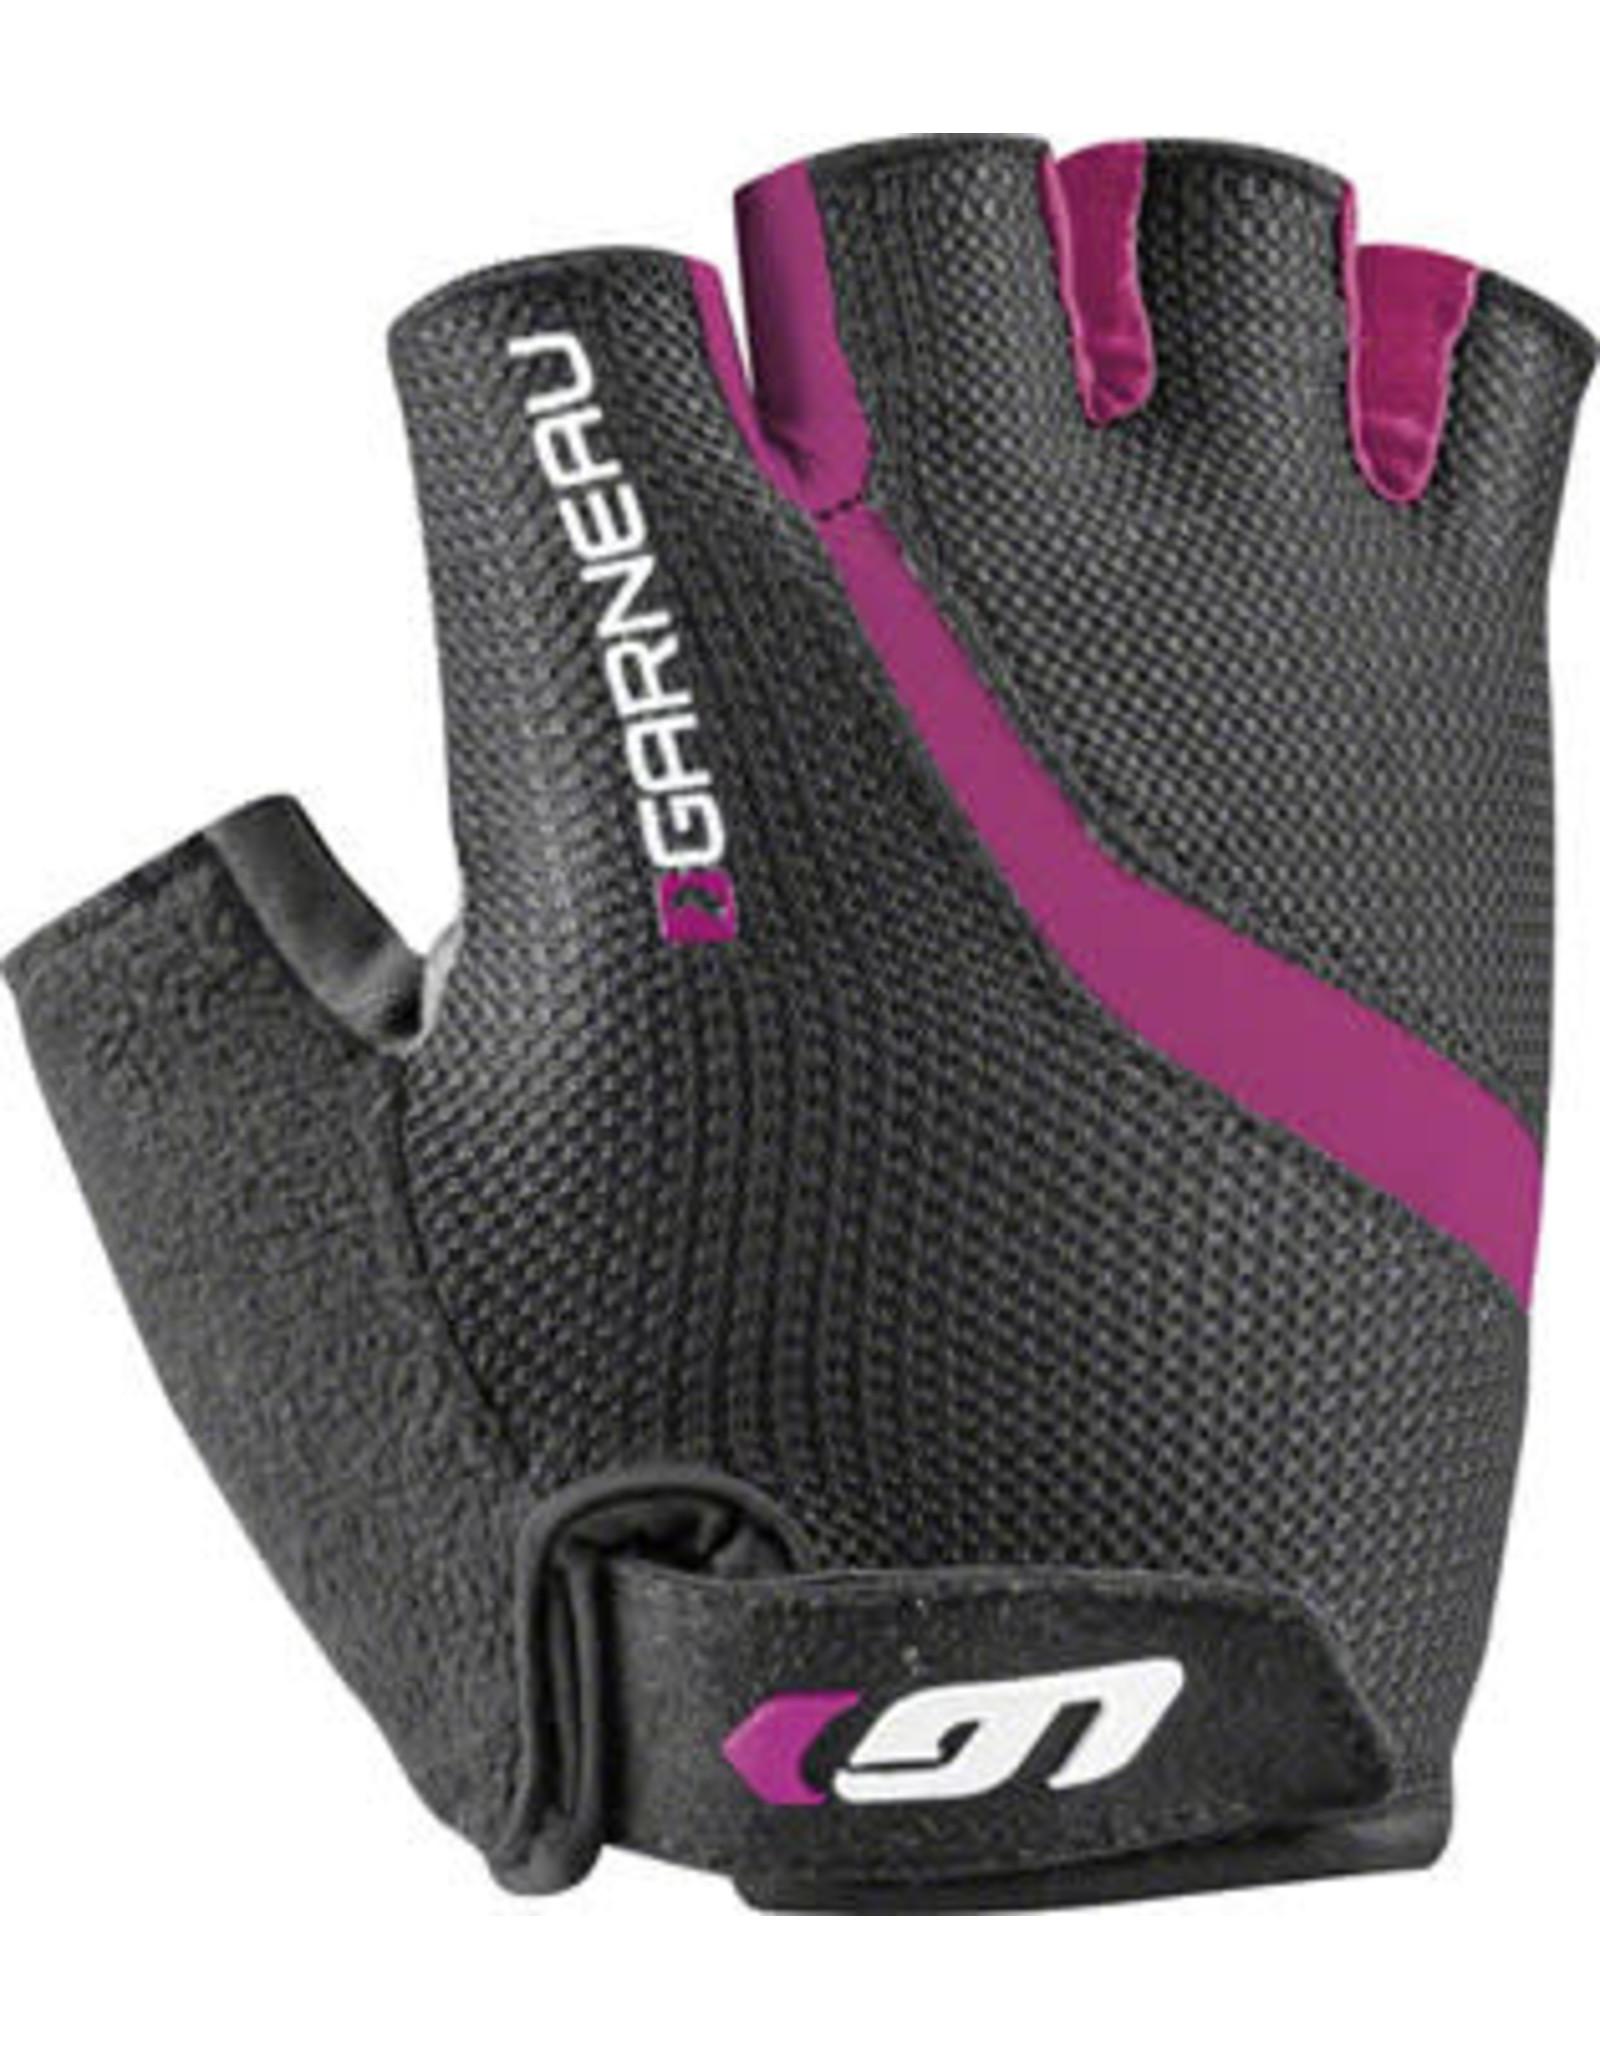 Garneau Biogel RX-V Gloves - Black/Fuscia Festival Pink, Short Finger, Women's, Small